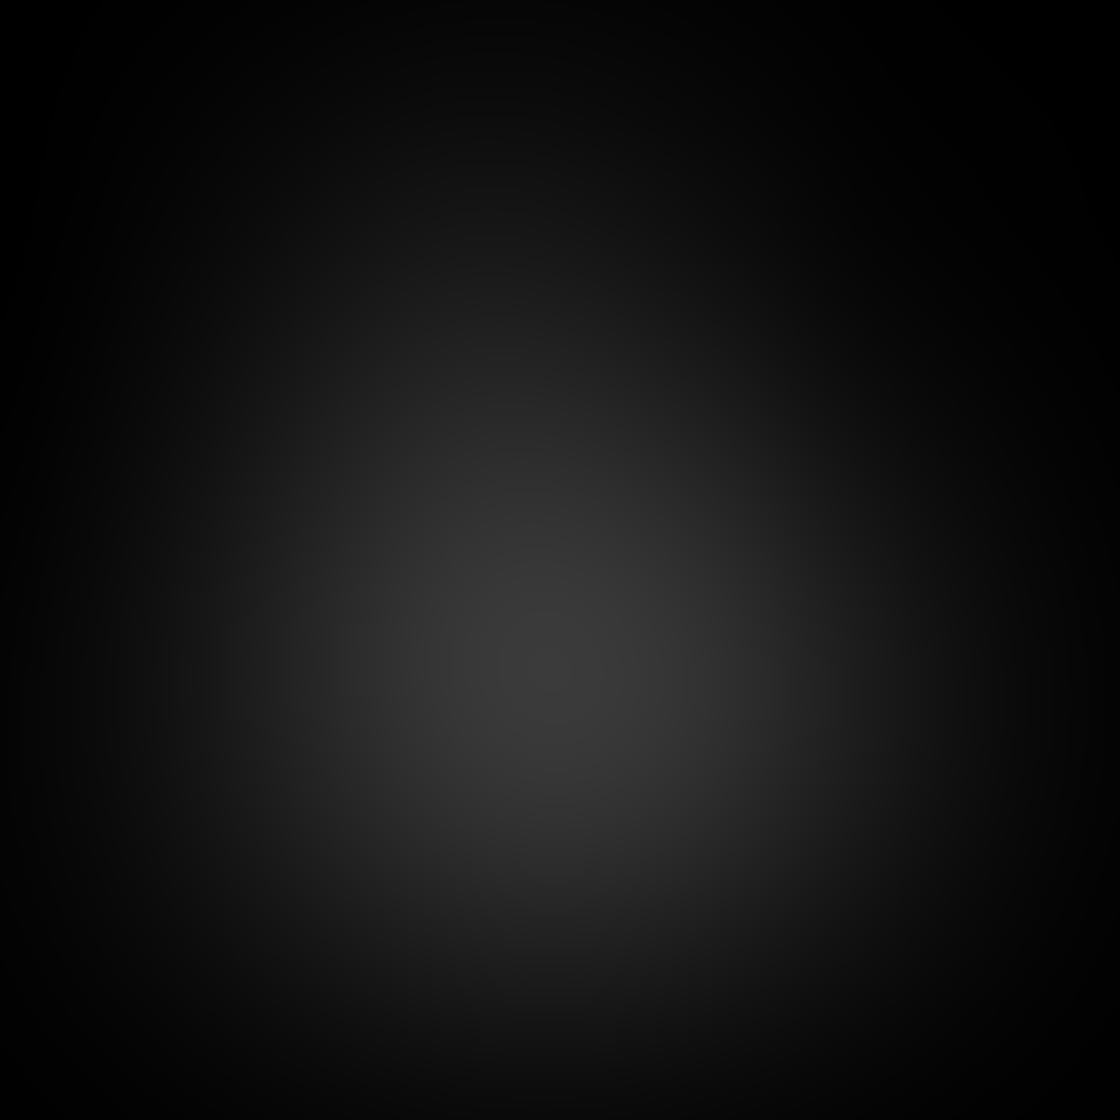 iPhone Photo Black White 8